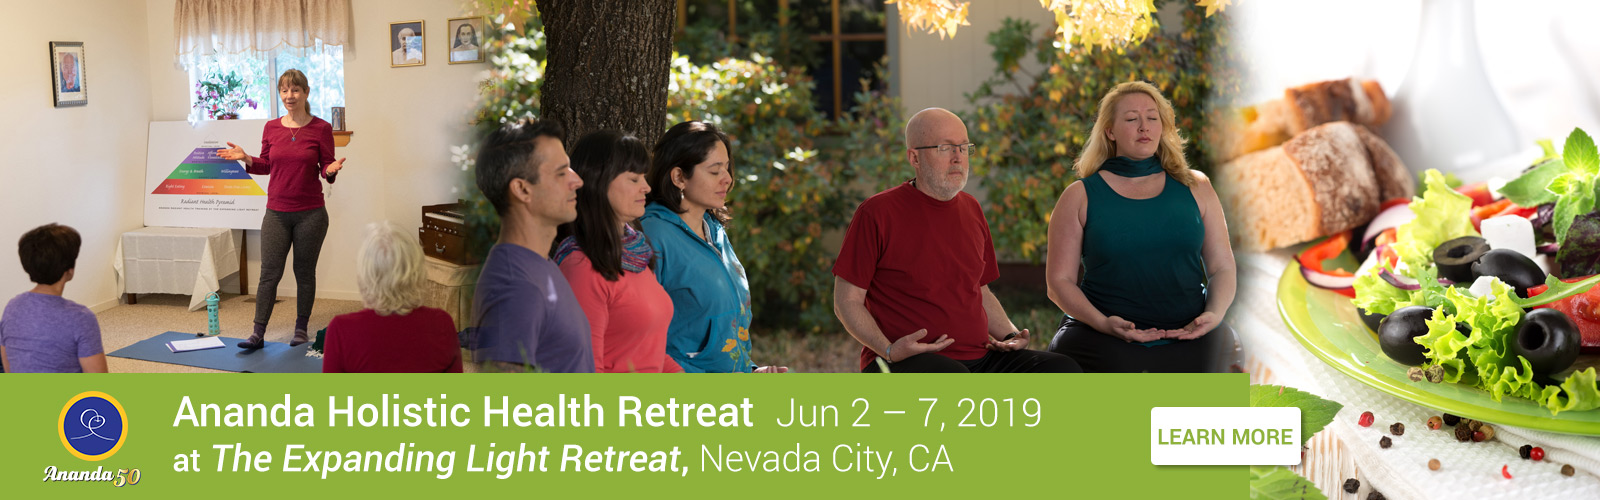 Ananda Holistic Health Retreat